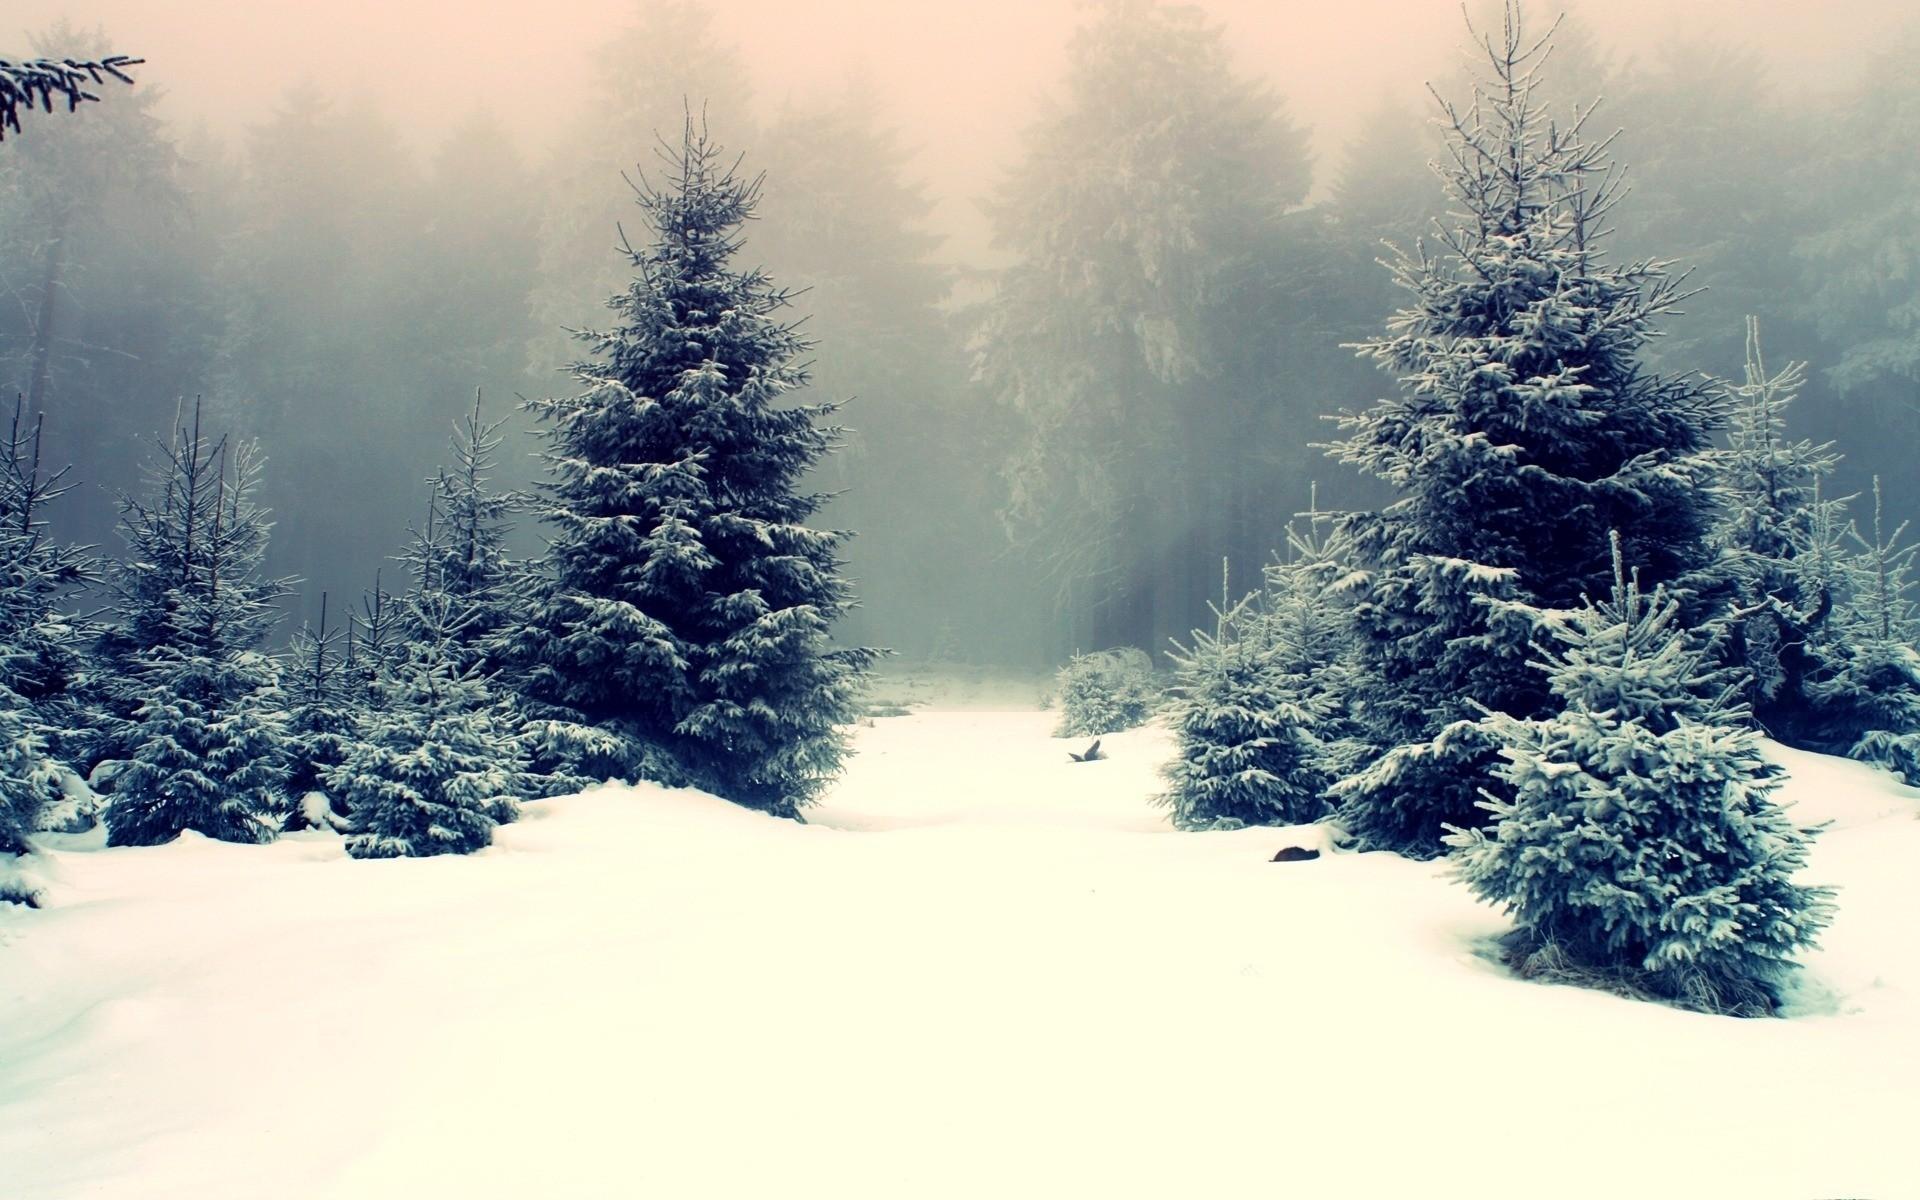 Winter Snow Wallpaper Winter, Snow, Forest